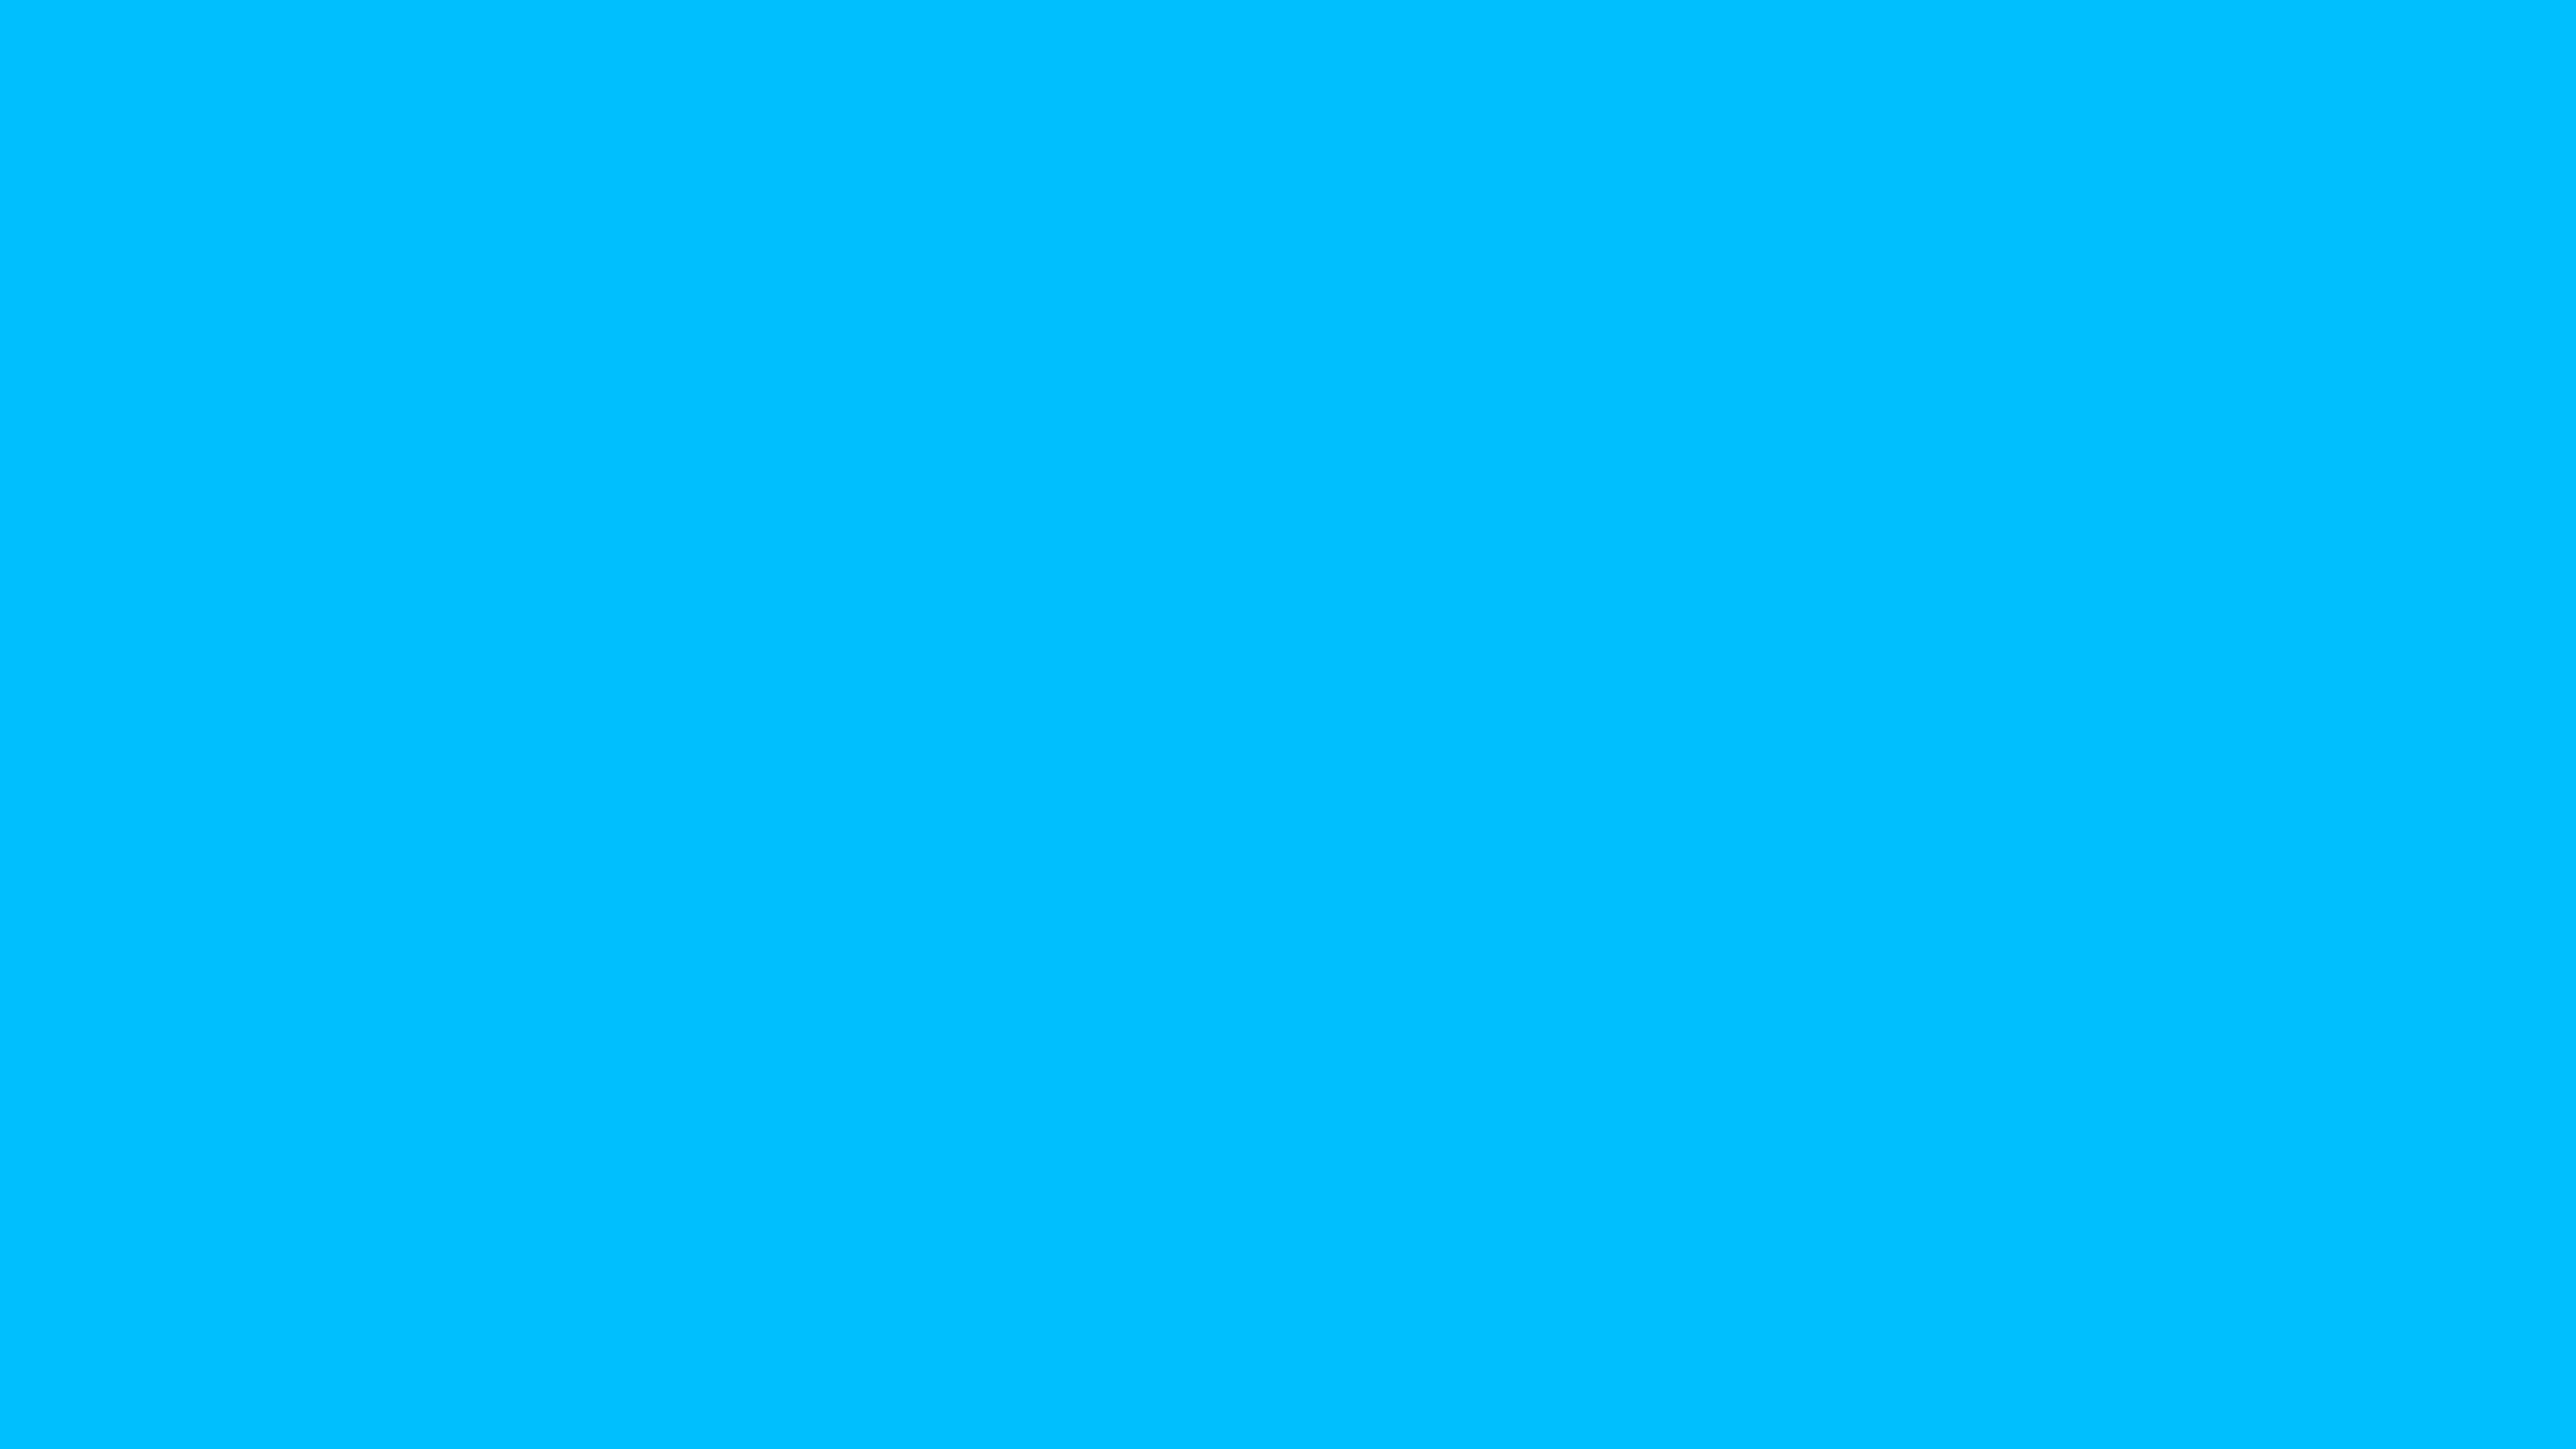 5120x2880 Capri Solid Color Background